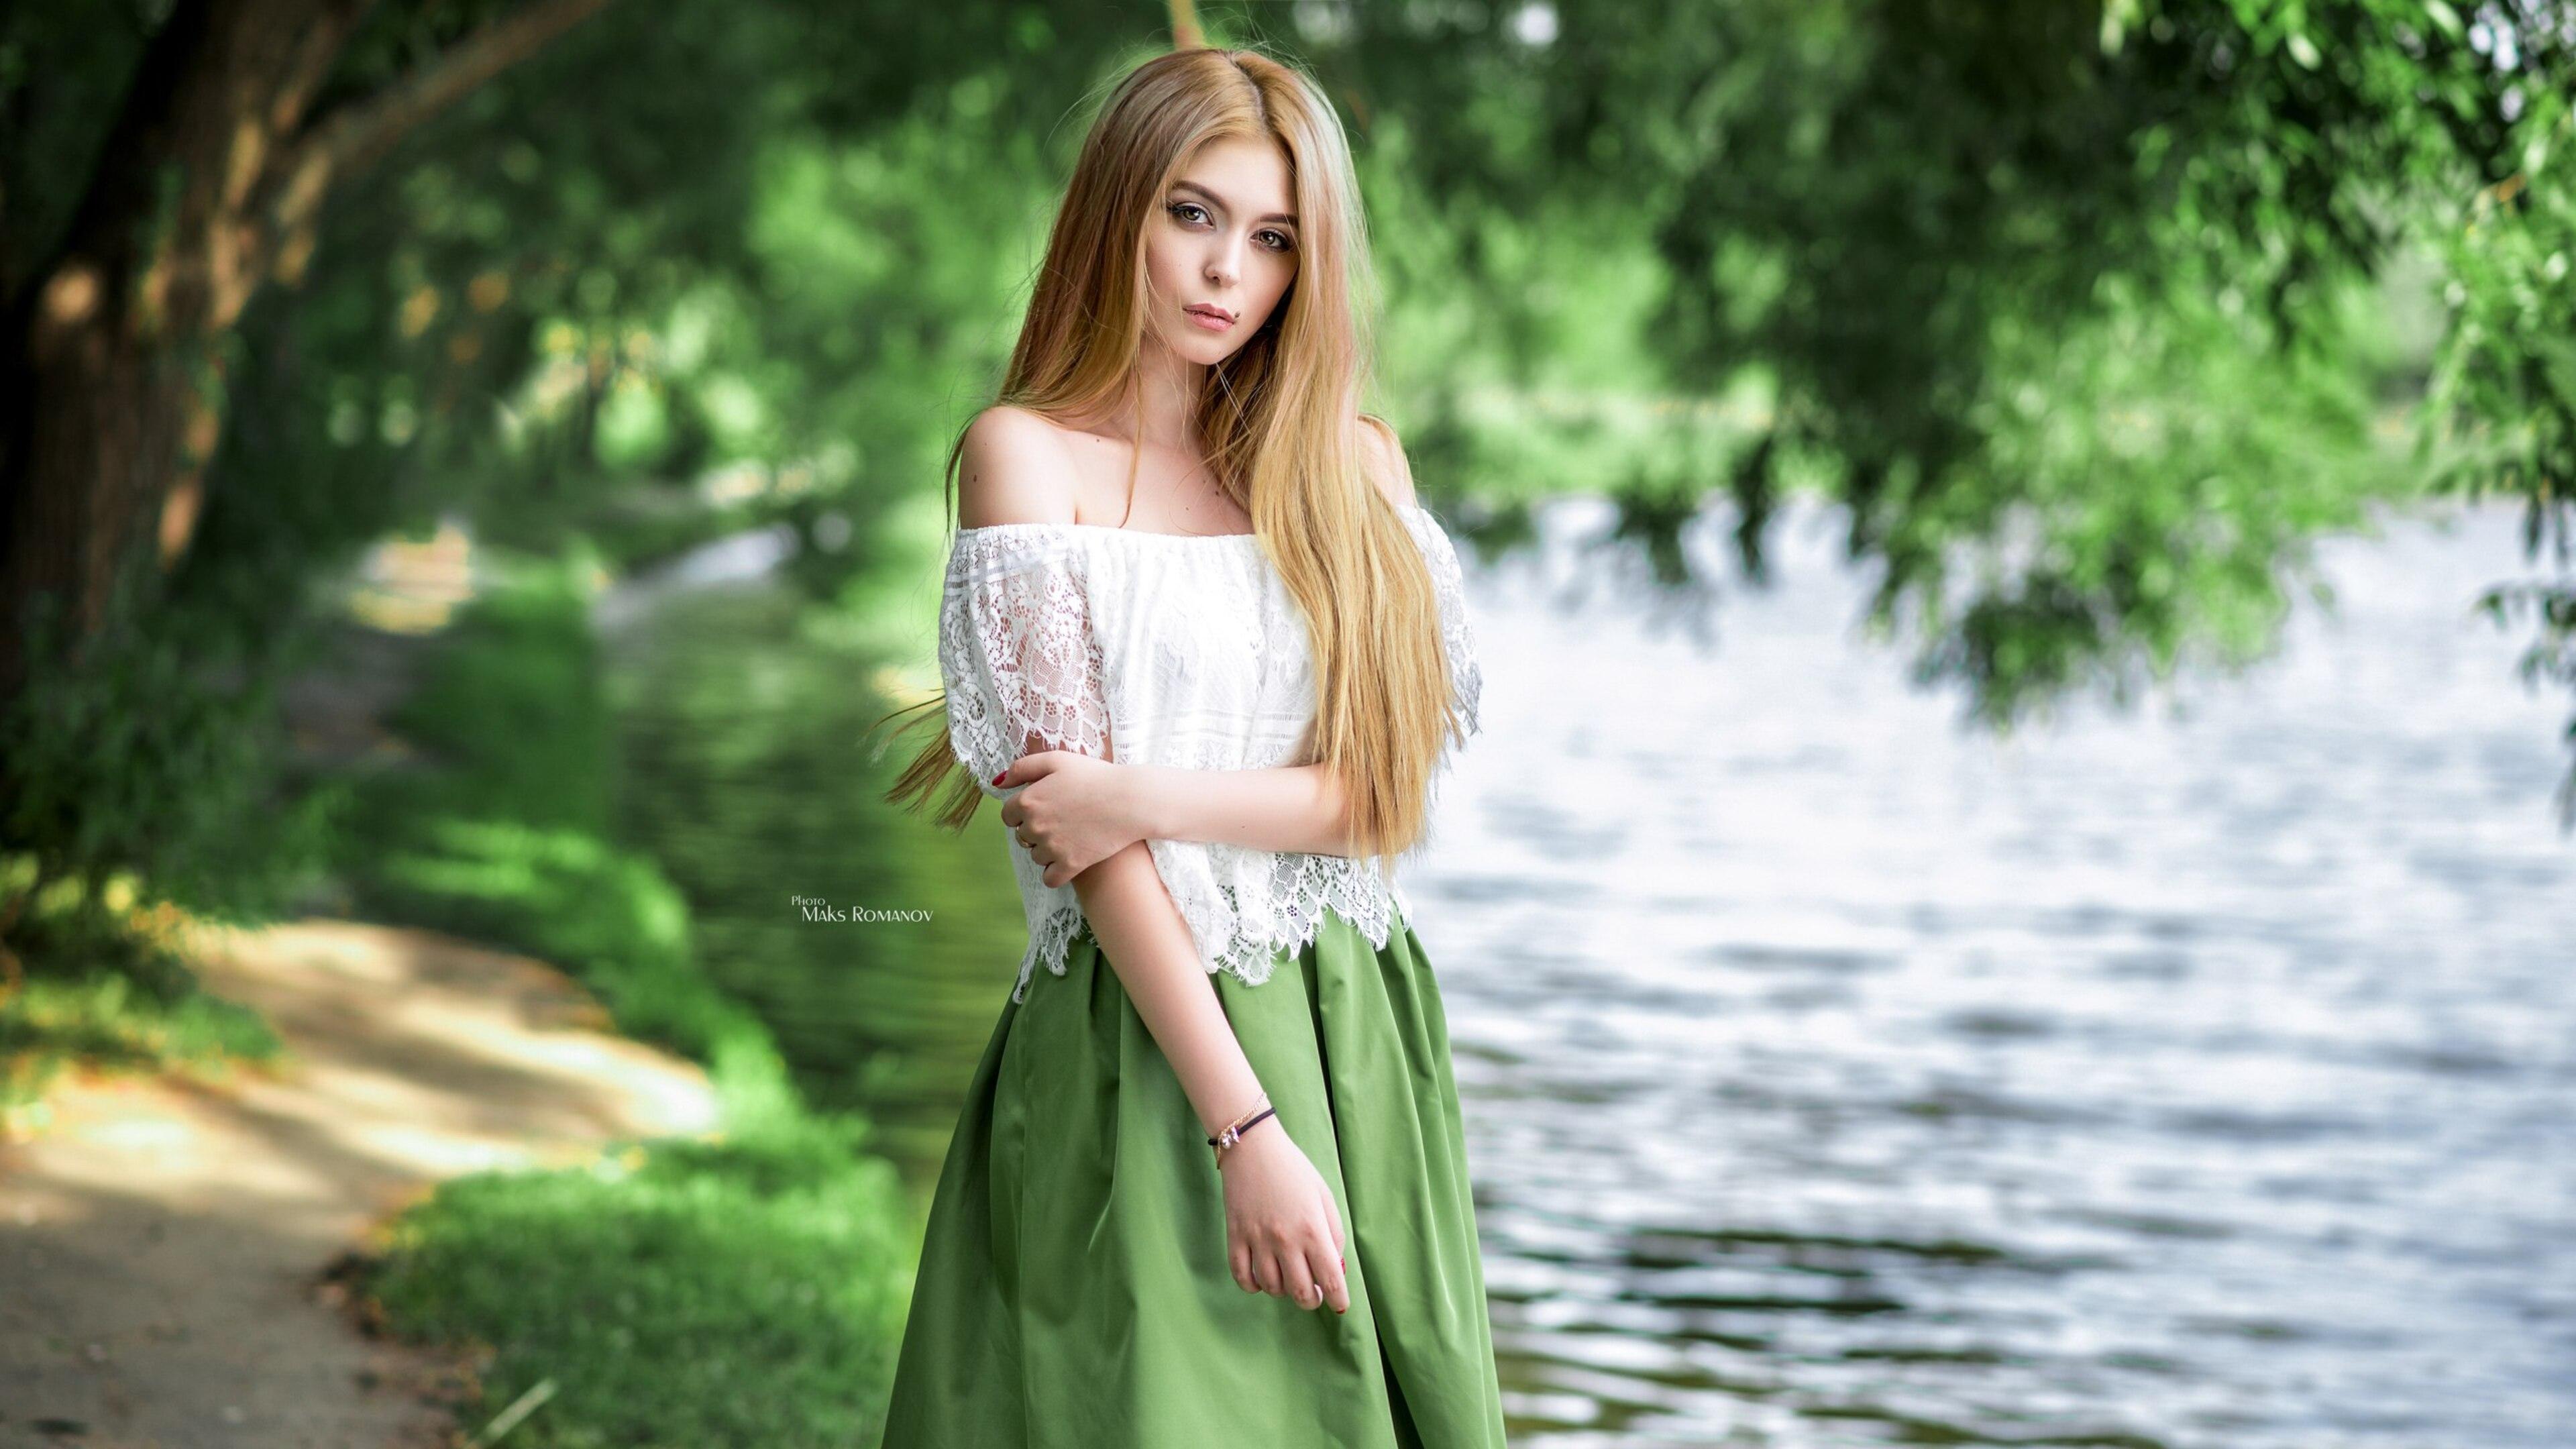 Beautiful Blonde Girl Smile Photo Hd Wallpaper | Metro